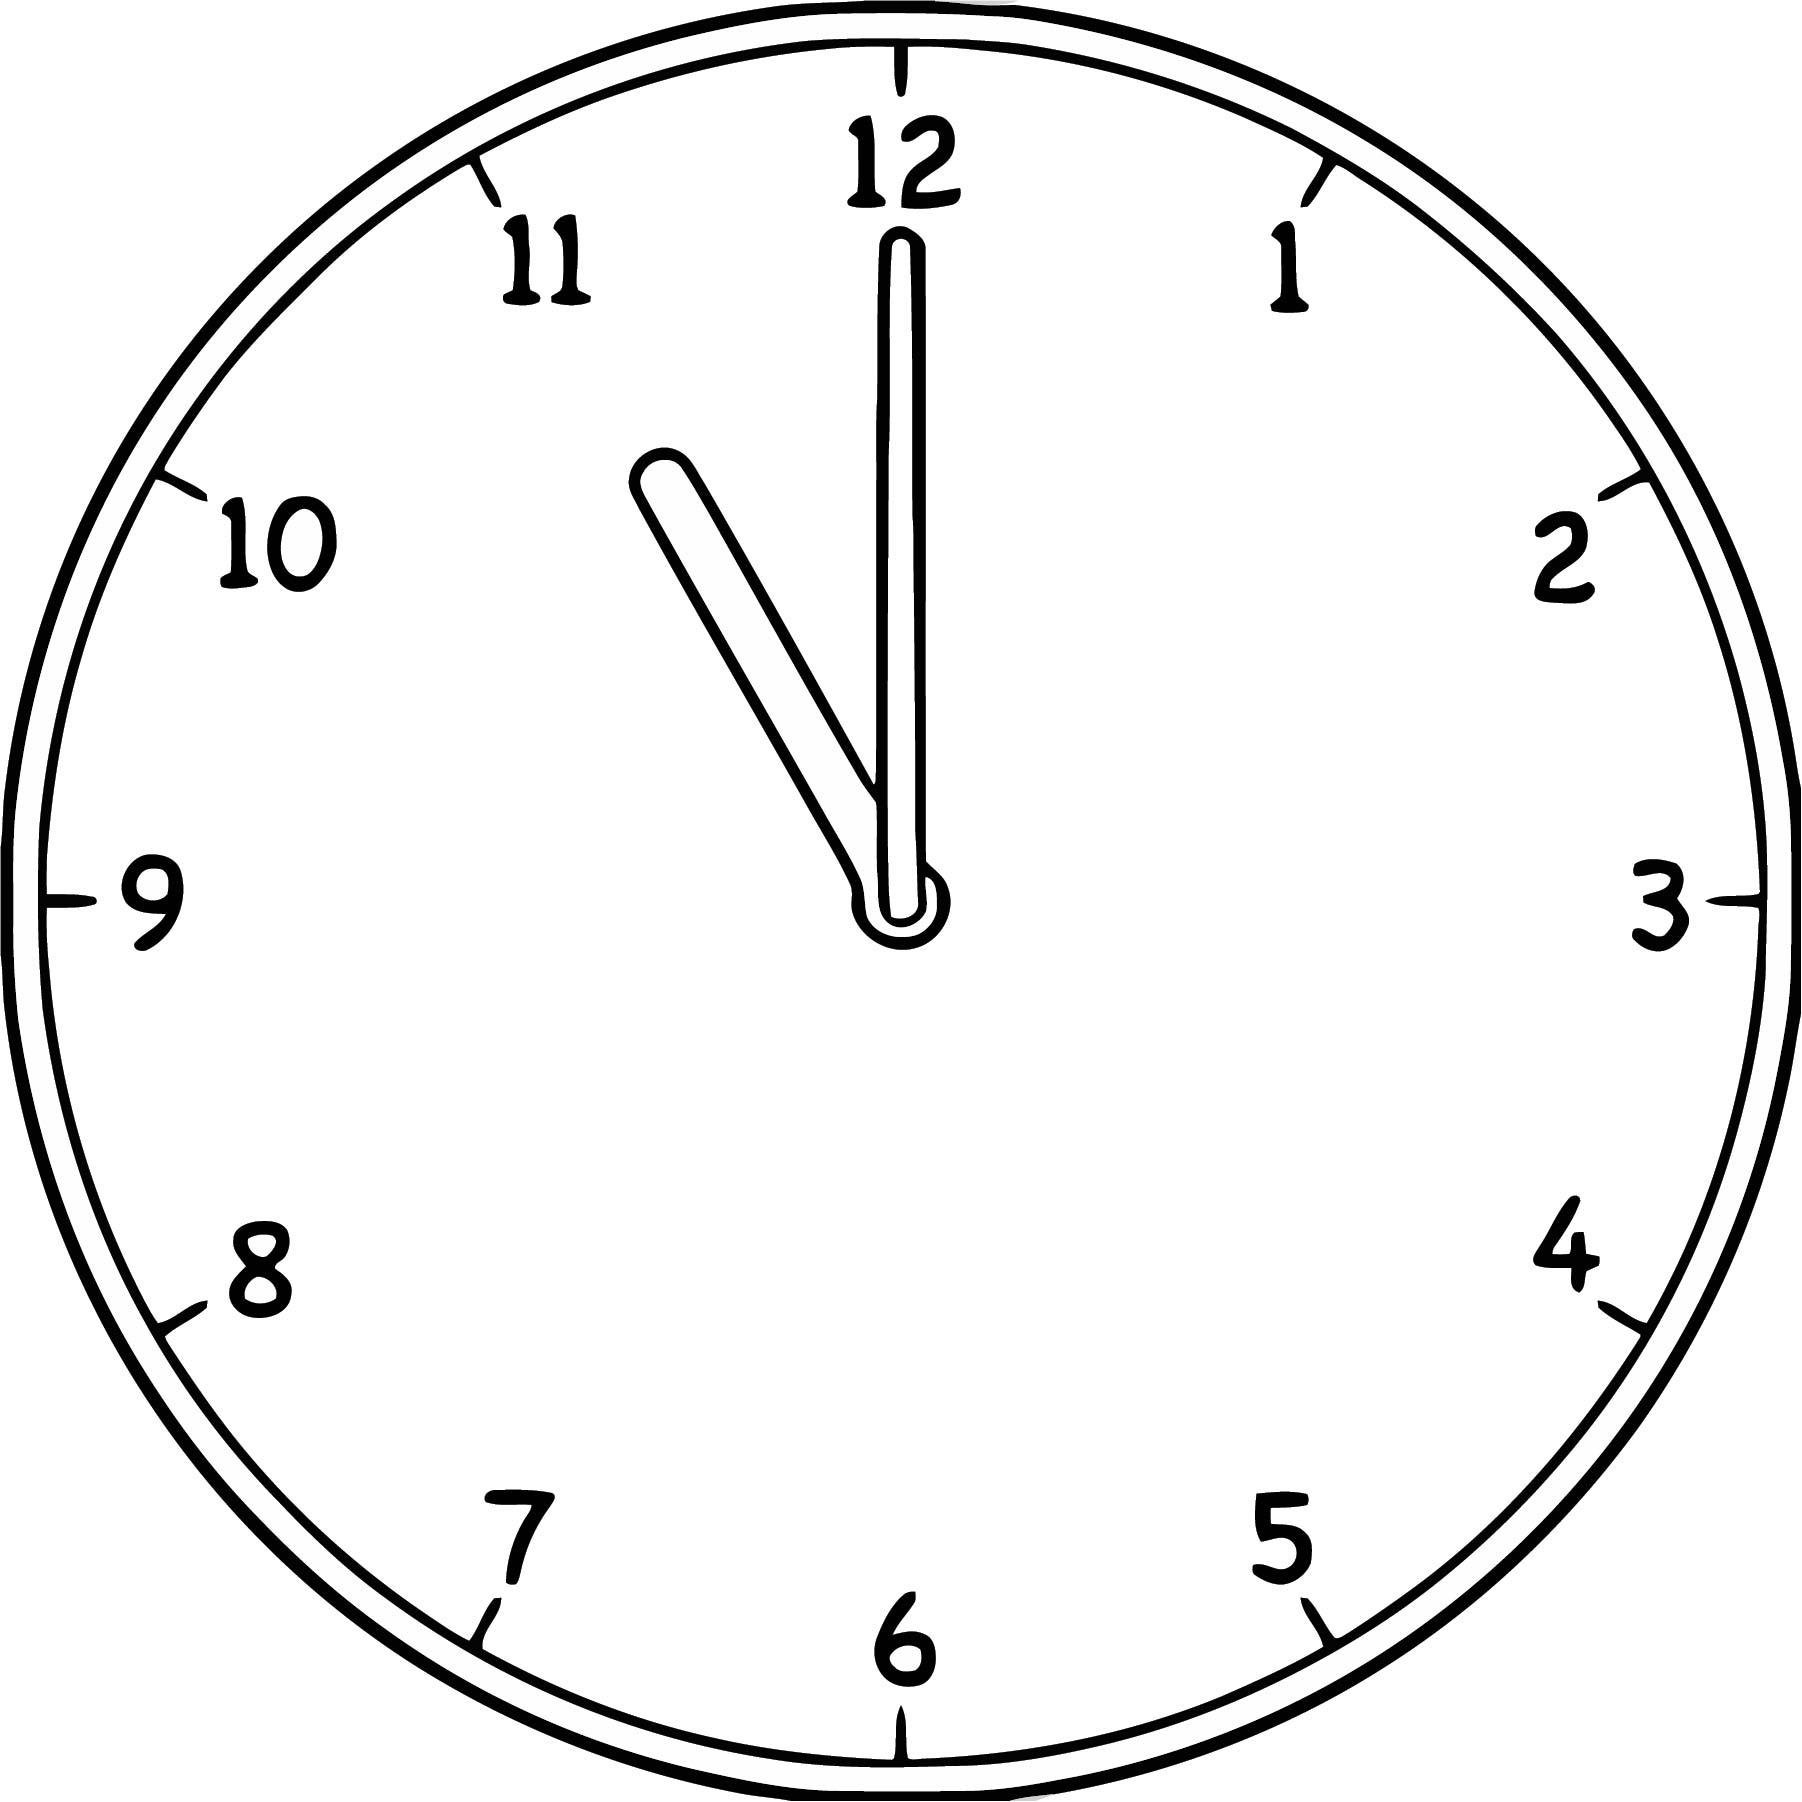 Large Clock Analog 11 Eleven 33 3 99 Free Printable 73 Cartoonized Free Printable Coloring Page